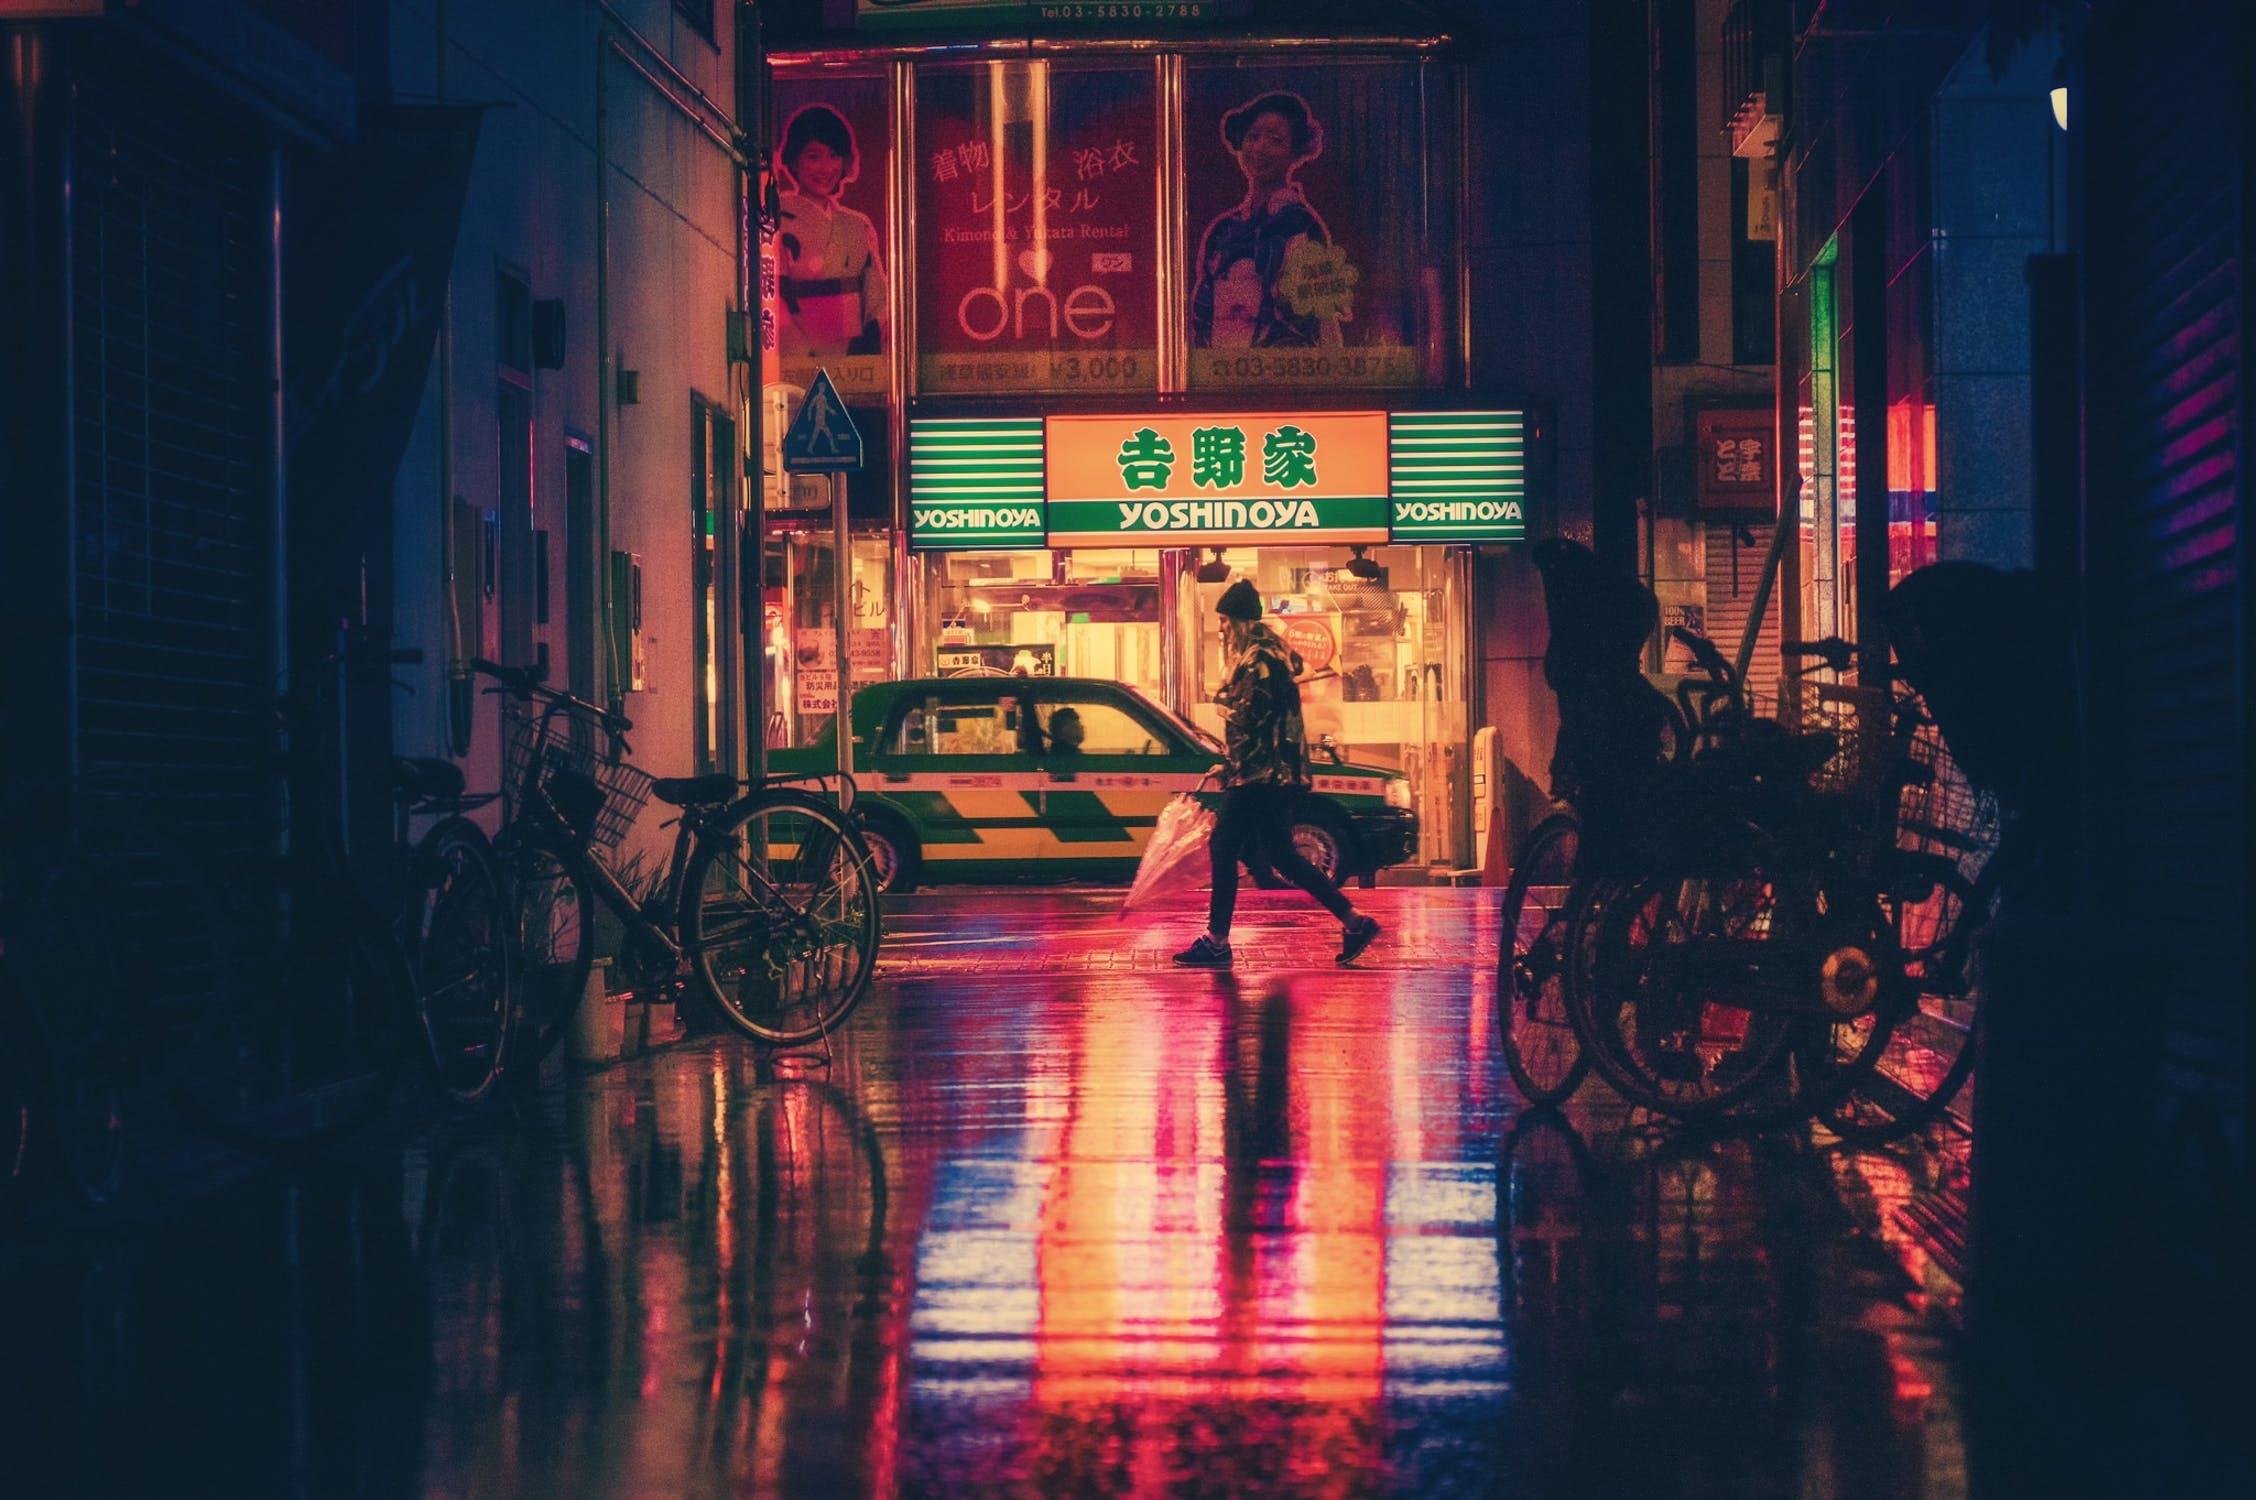 pexels-photo-315191.jpeg